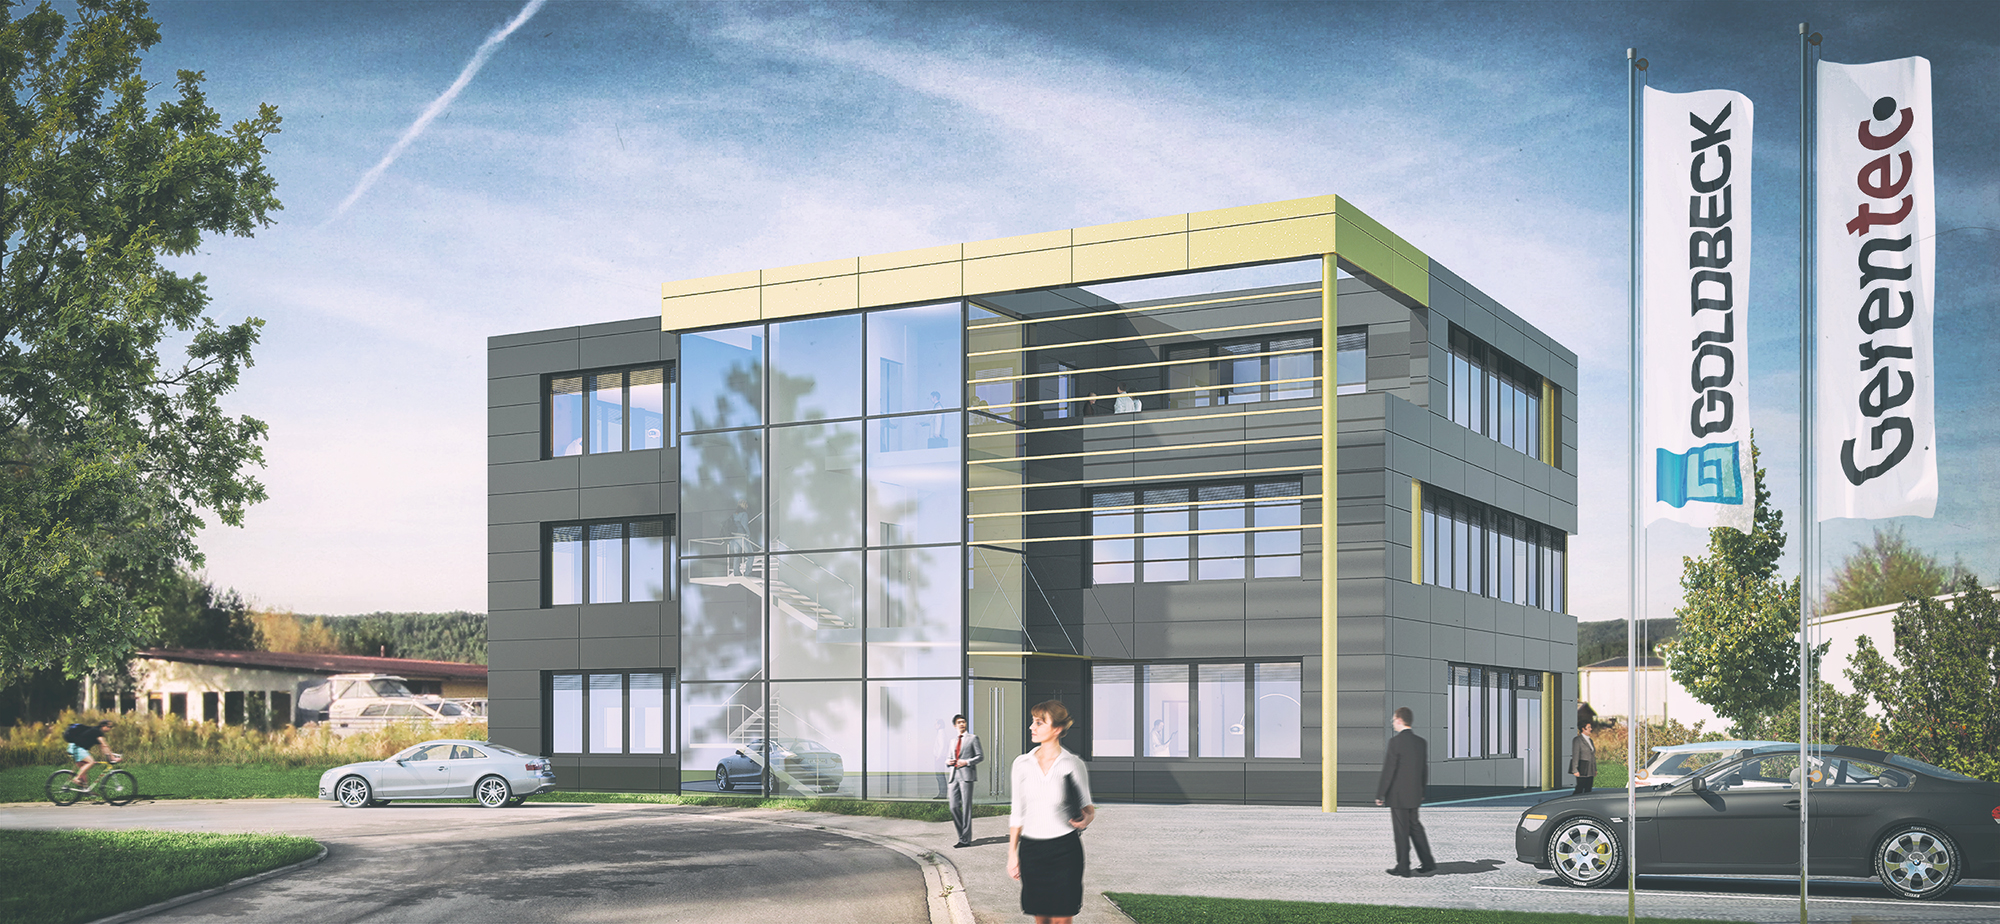 Anjana Perera Visualisierung - Bürogebäude Gerentec GmbH, Radolfzell - Goldbeck Süd